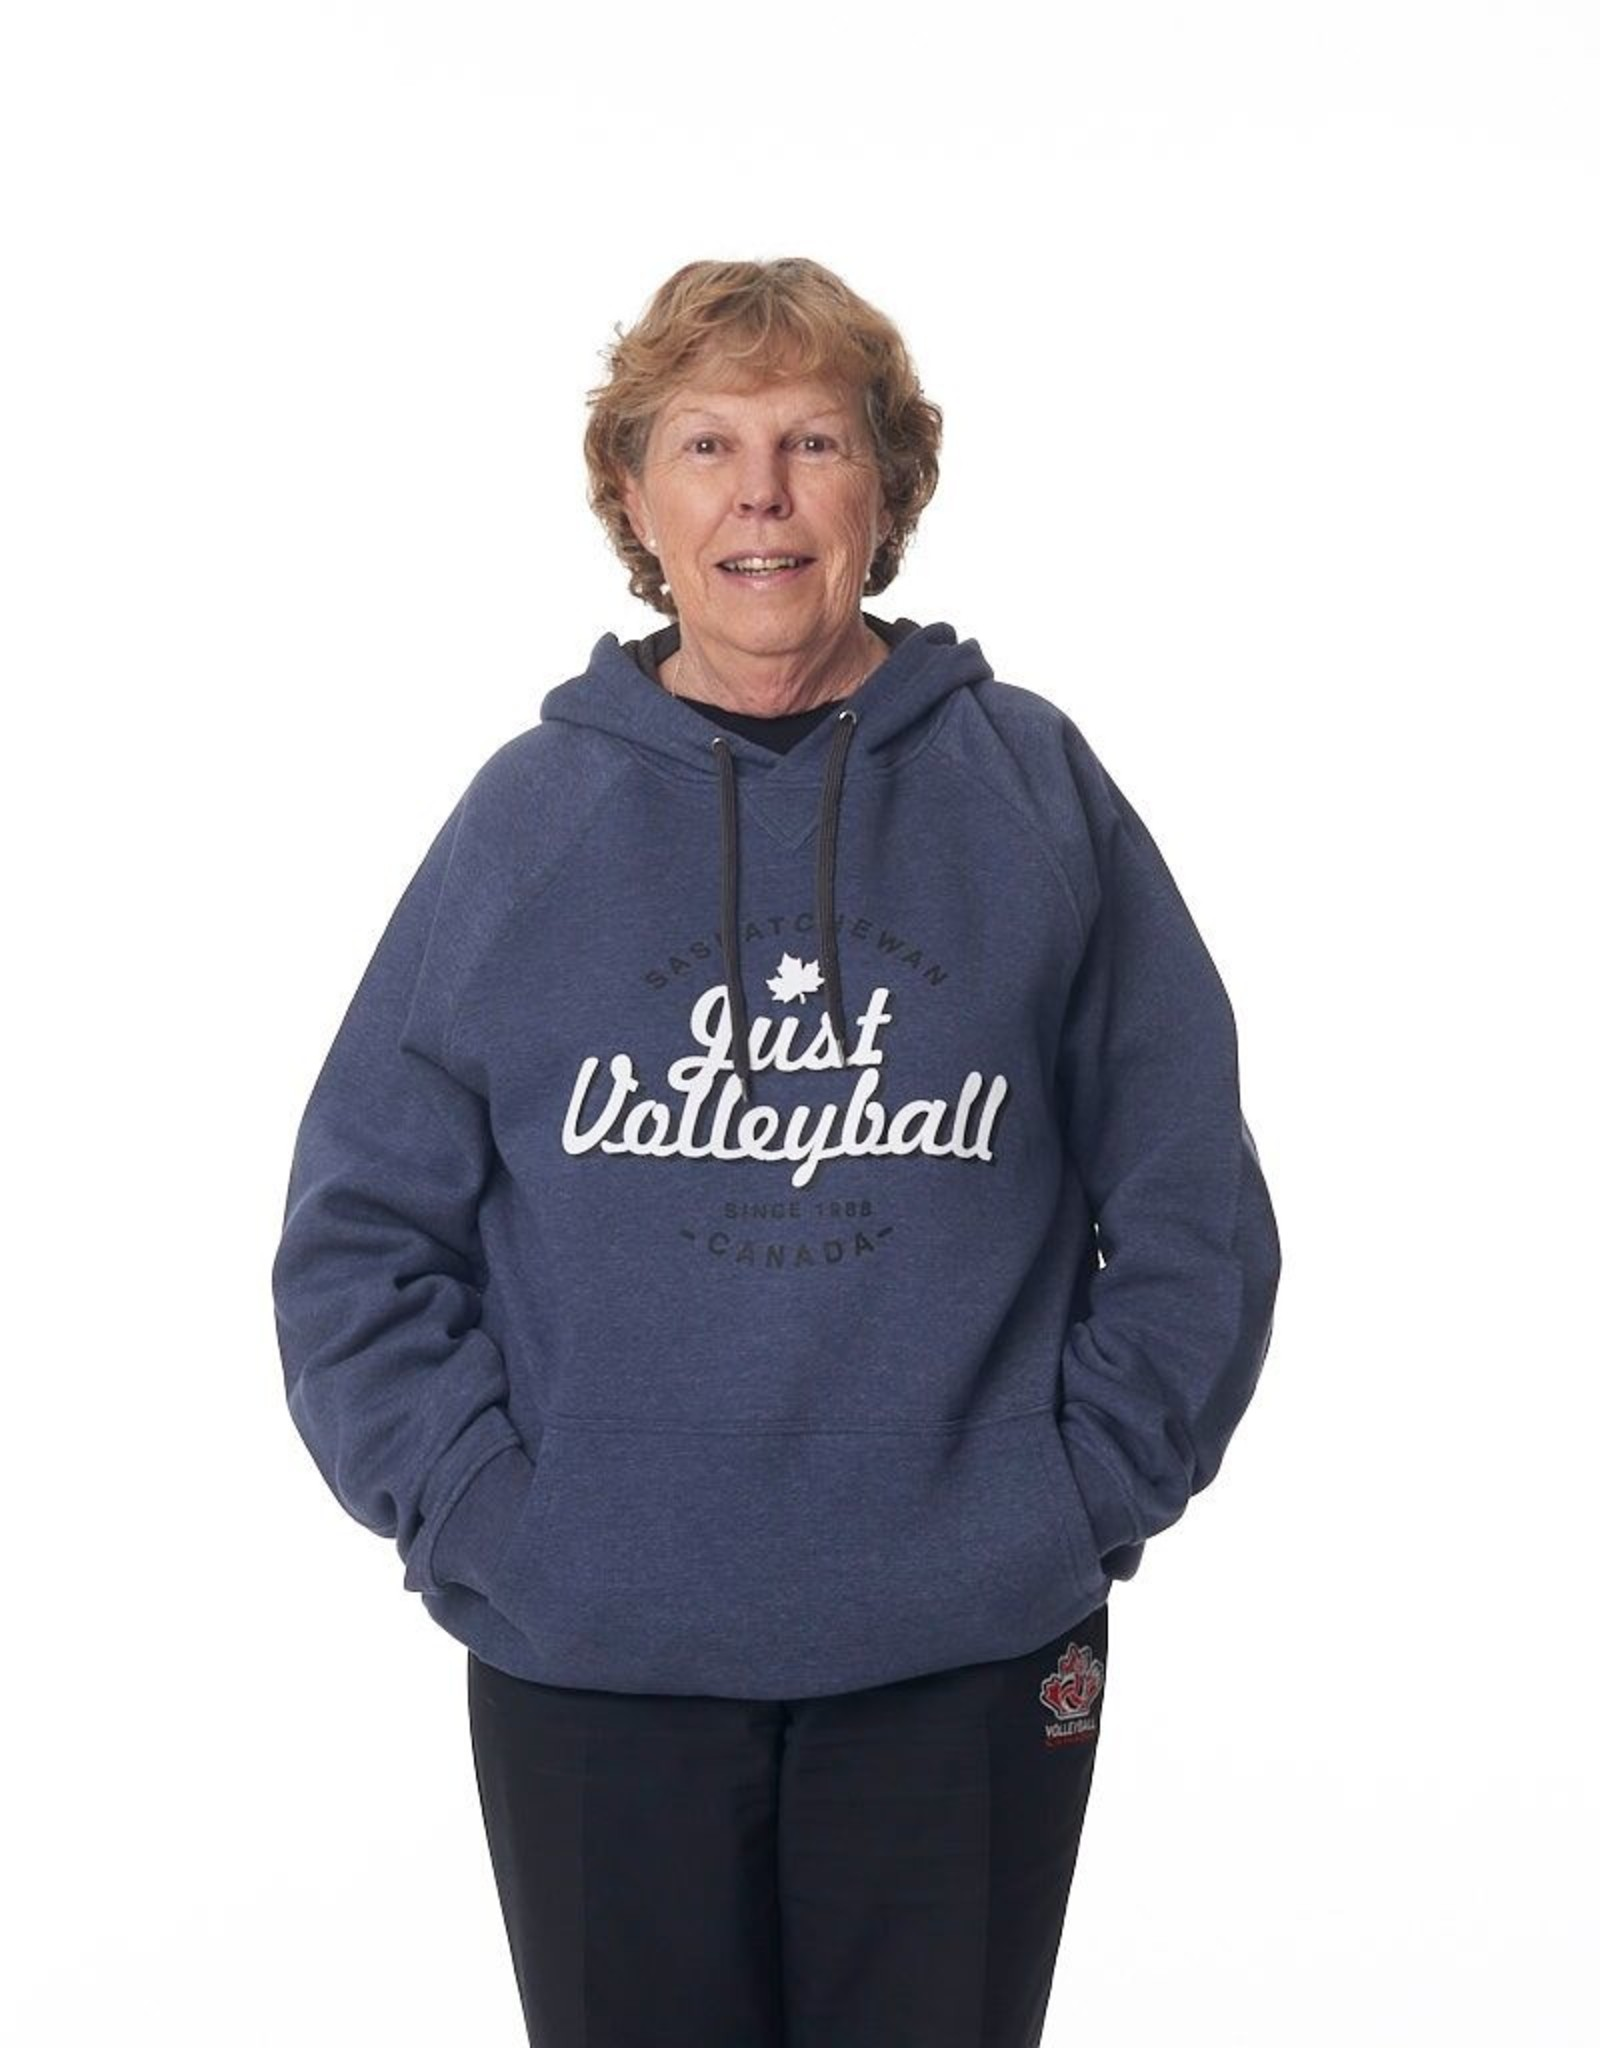 Just Volleyball JV Vintage Men's Hood F2045